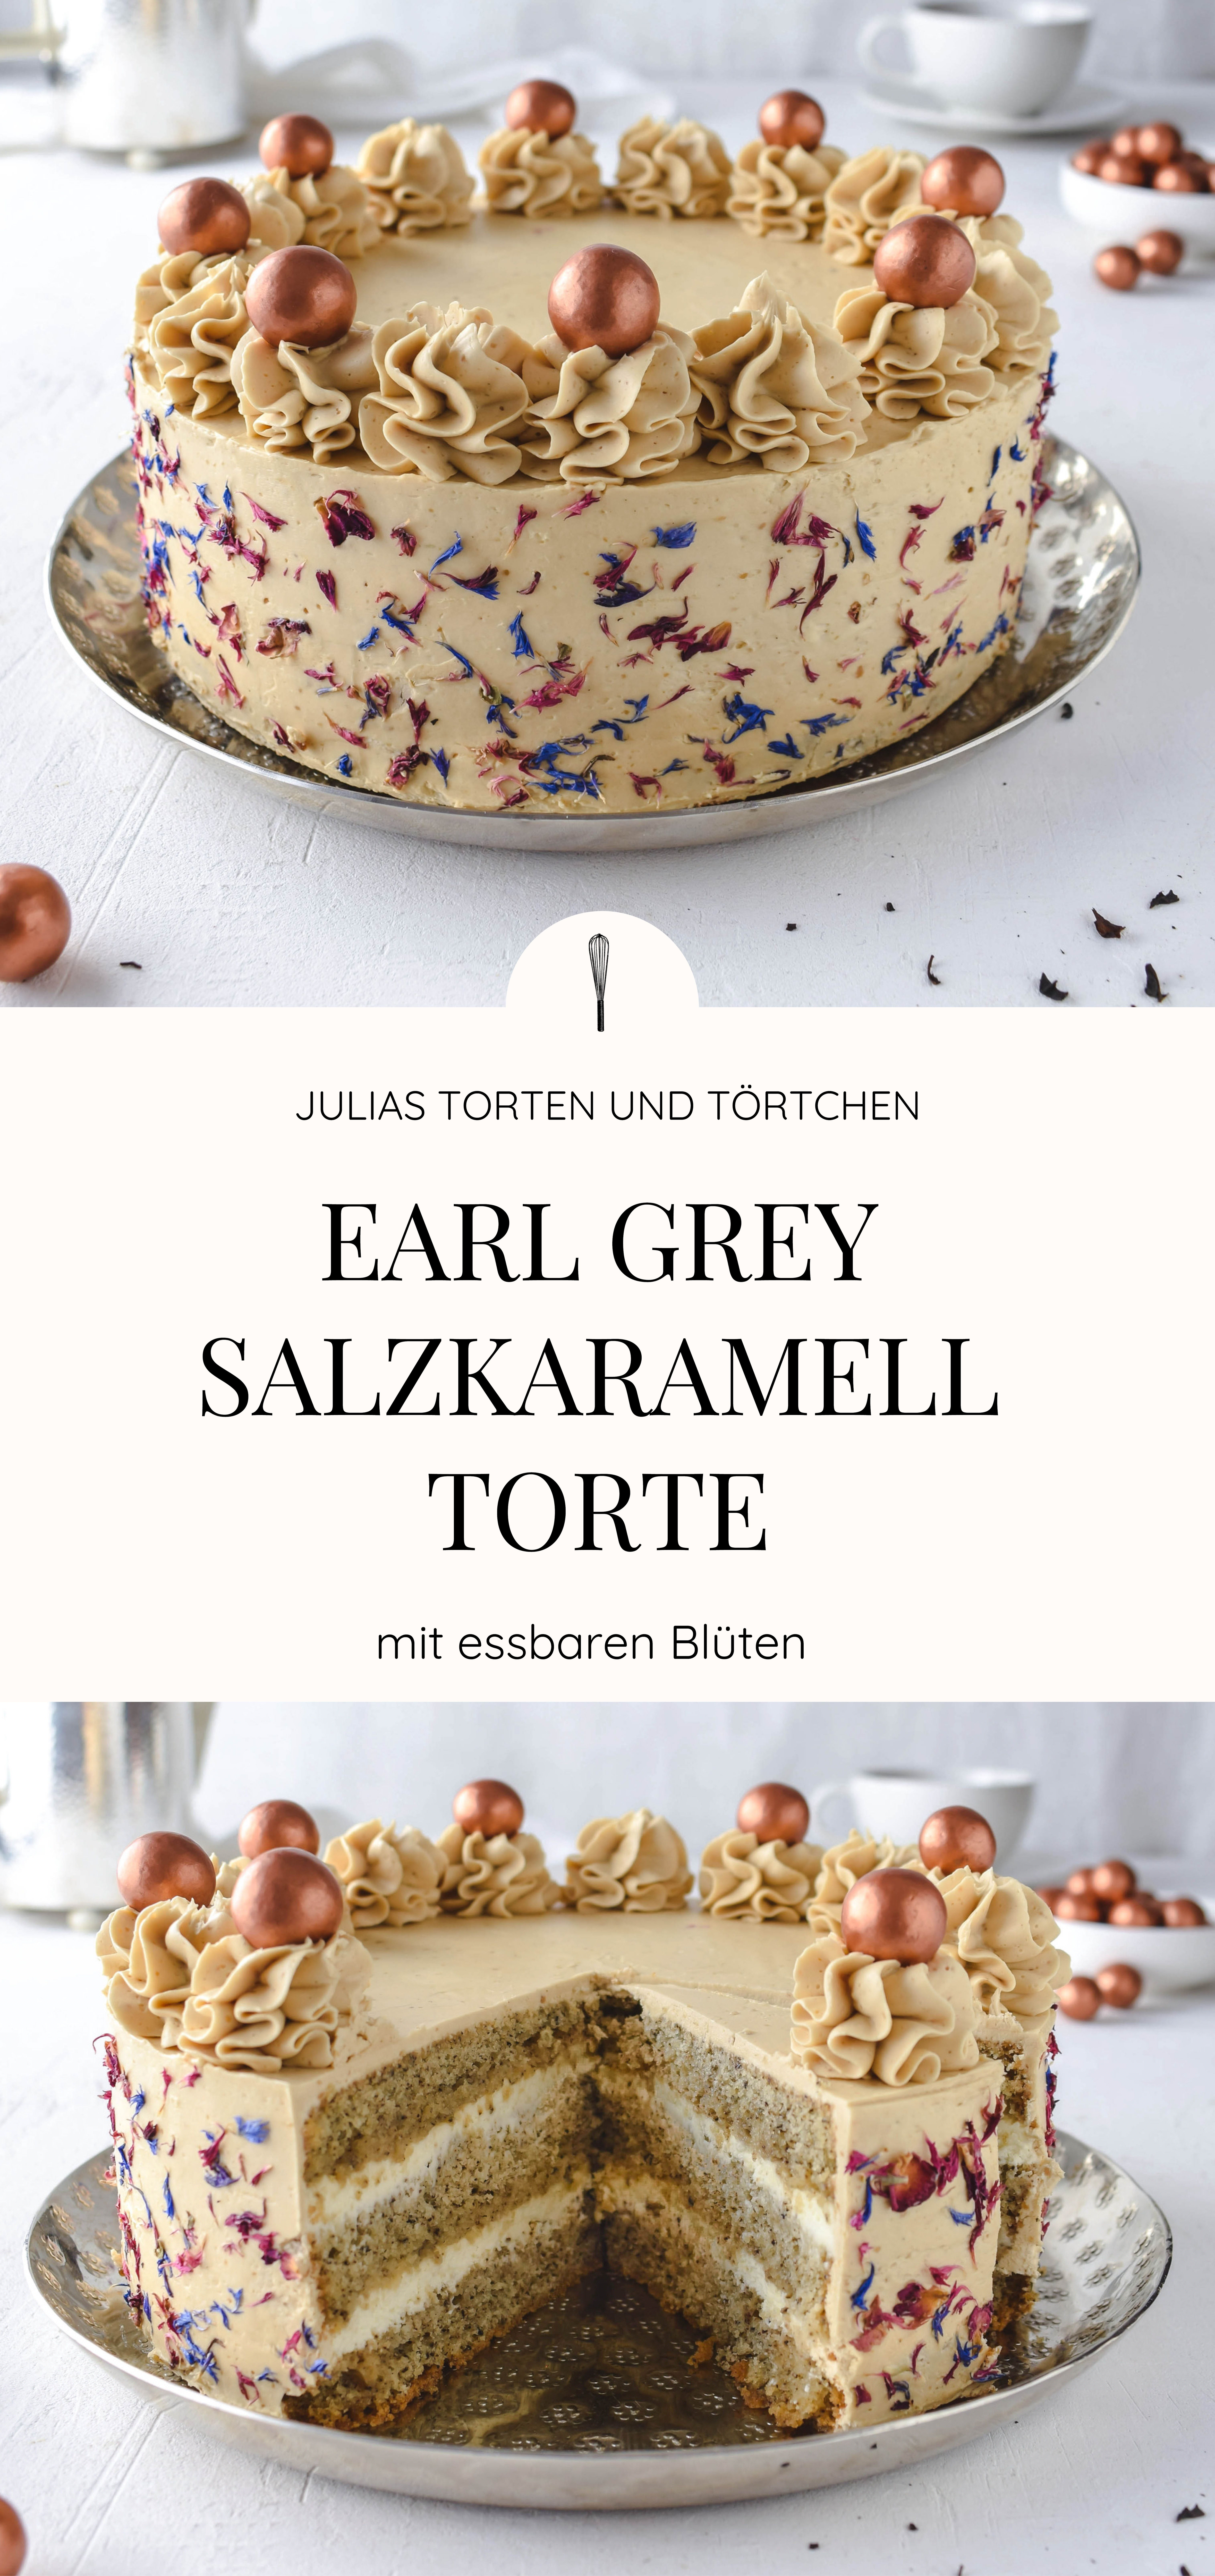 Photo of Earl Grey Salzkaramell Torte mit Mascarponefüllung